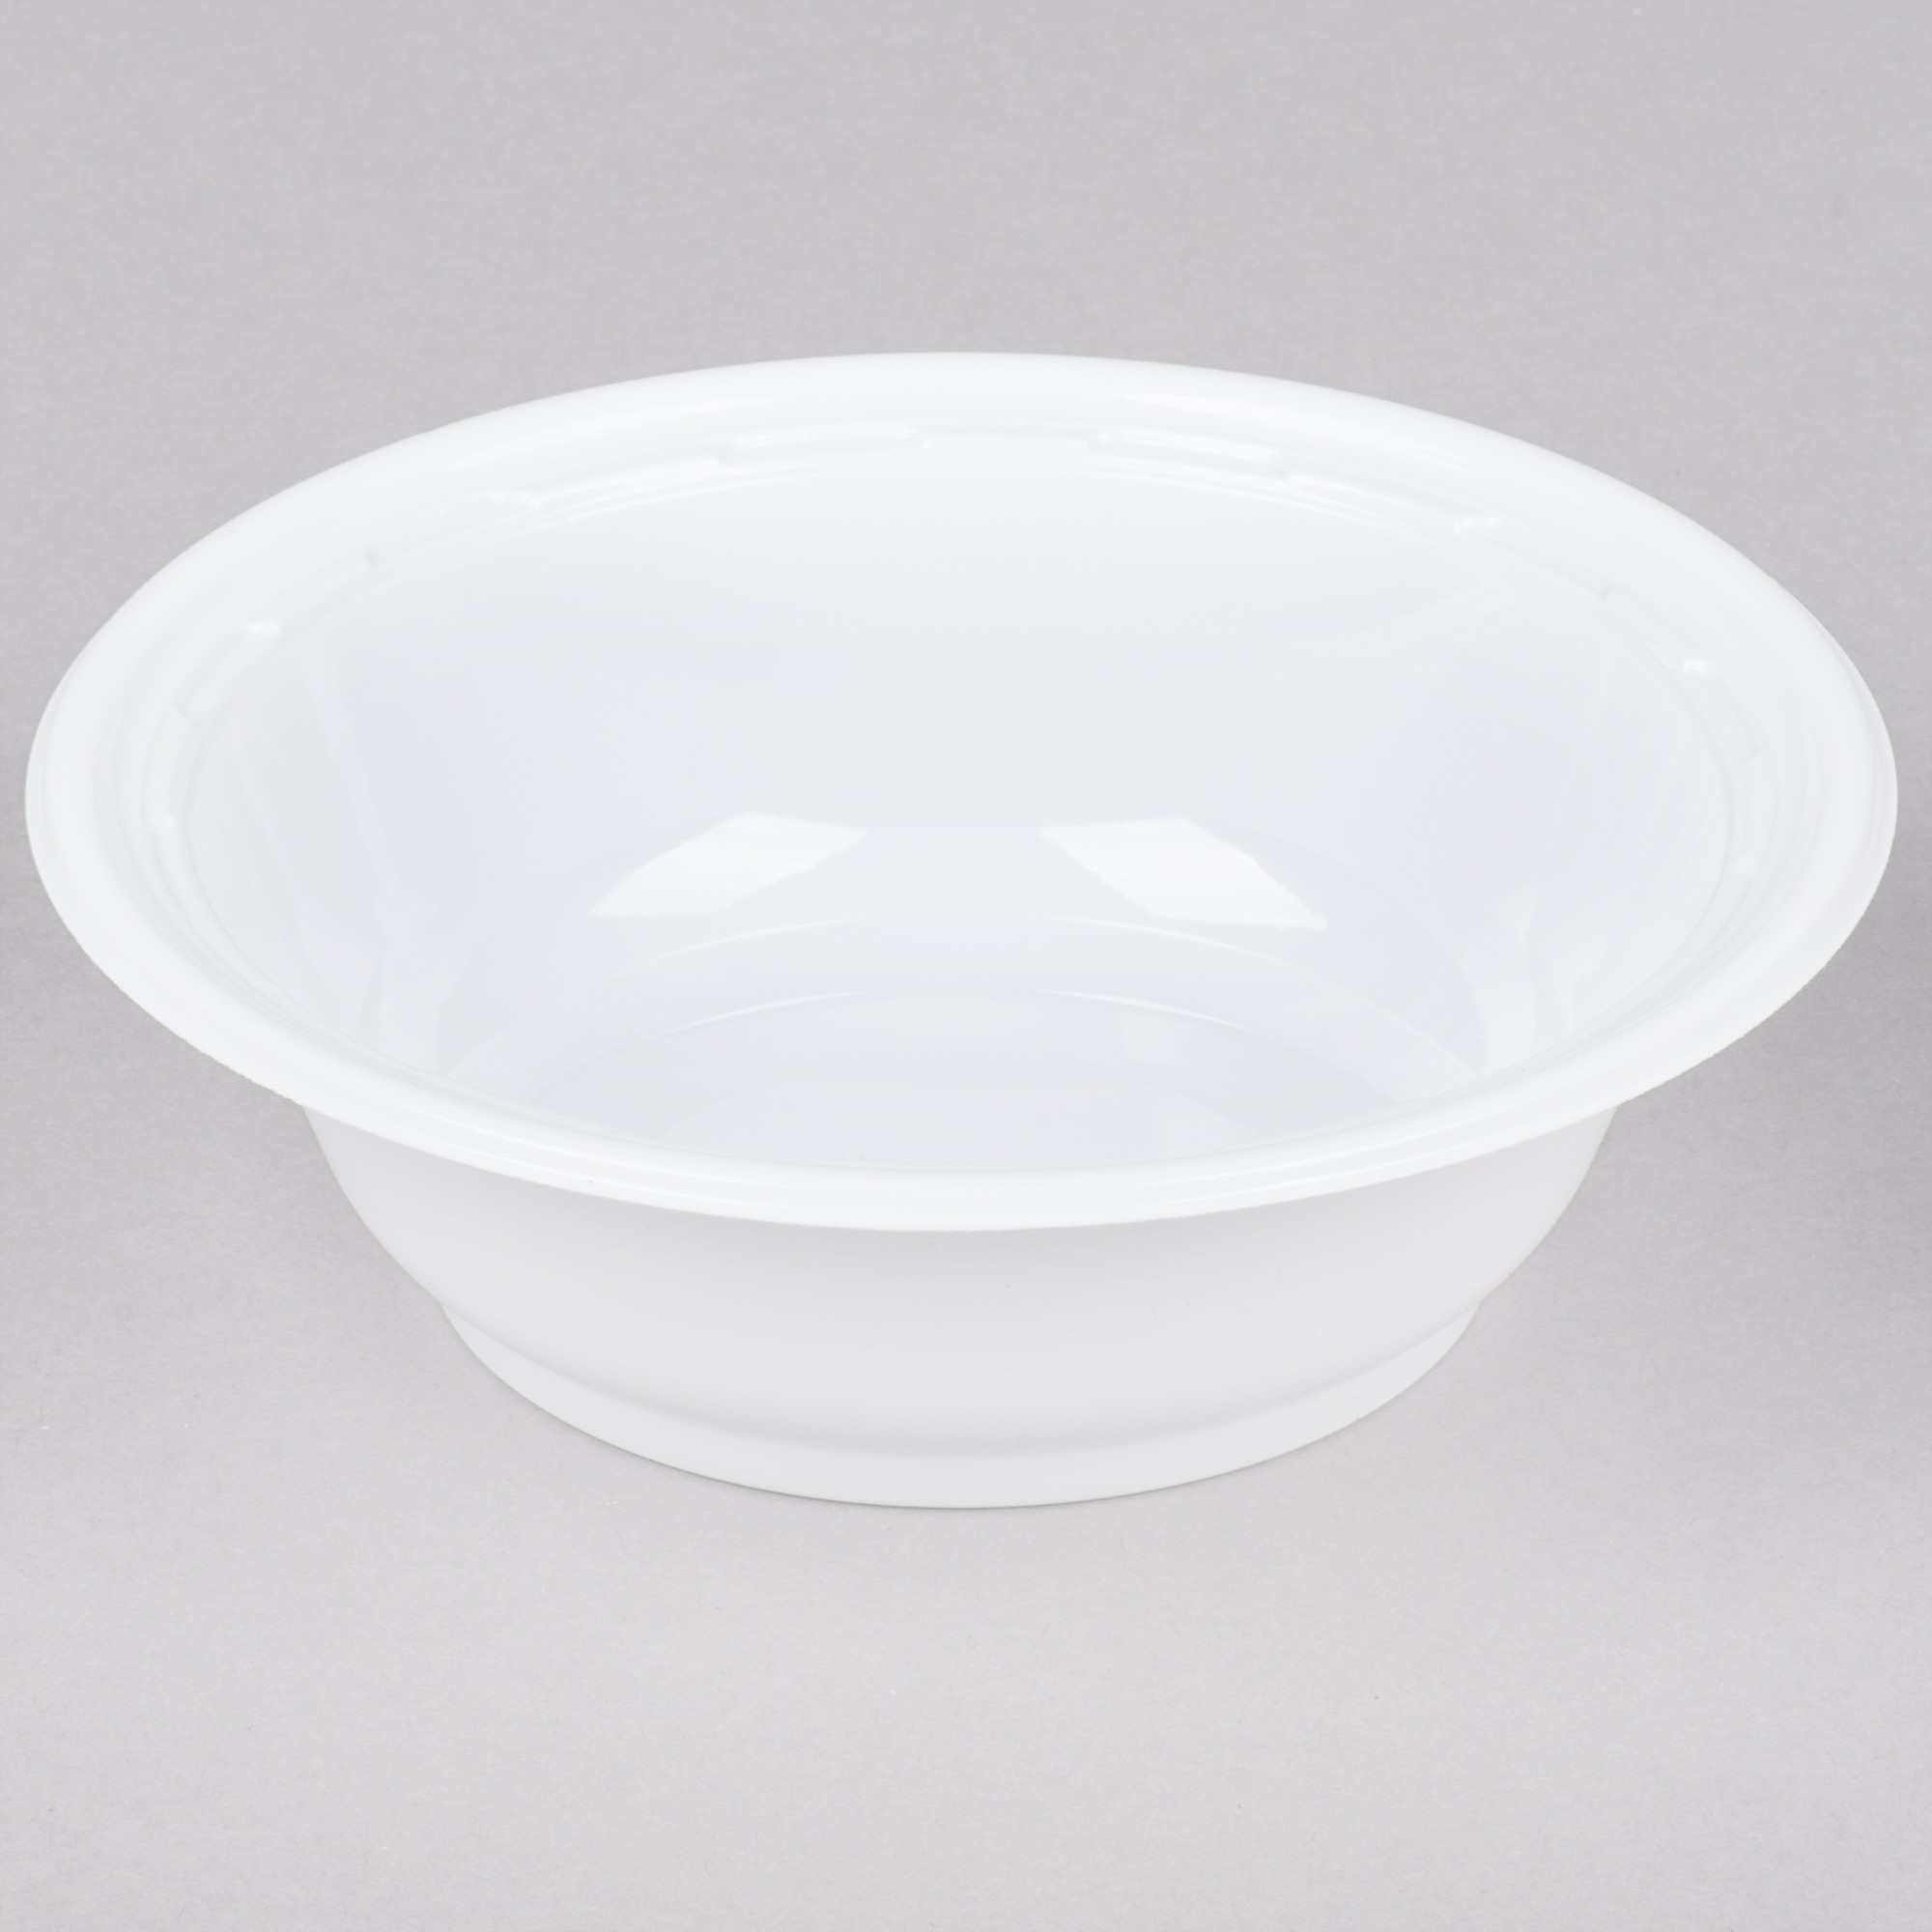 Dodge Packaging » 5oz White Plastic Bowl